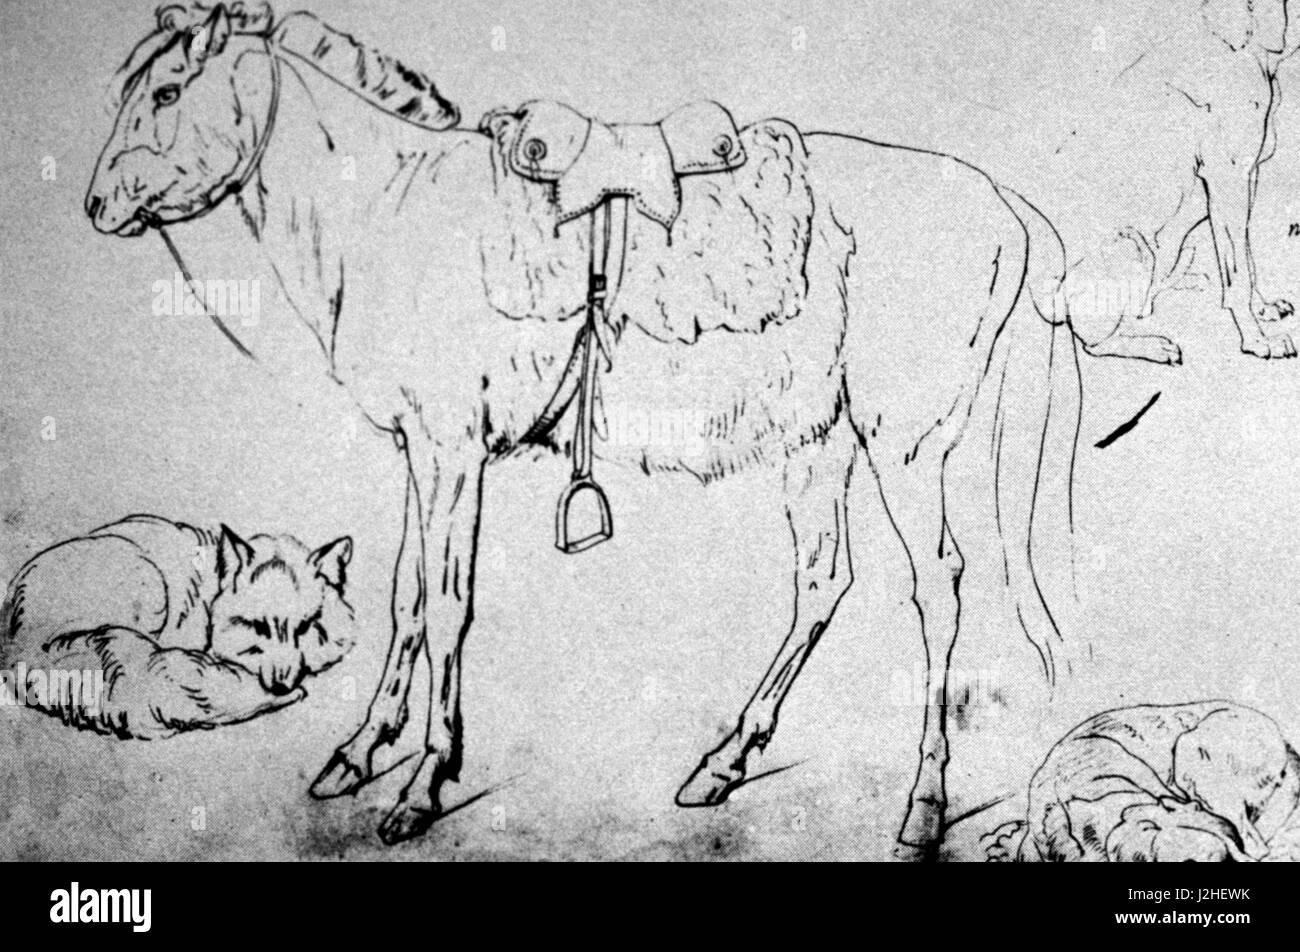 Historic 1852 Sketch by Kurz of a Blackfeet Indian pony - Stock Image